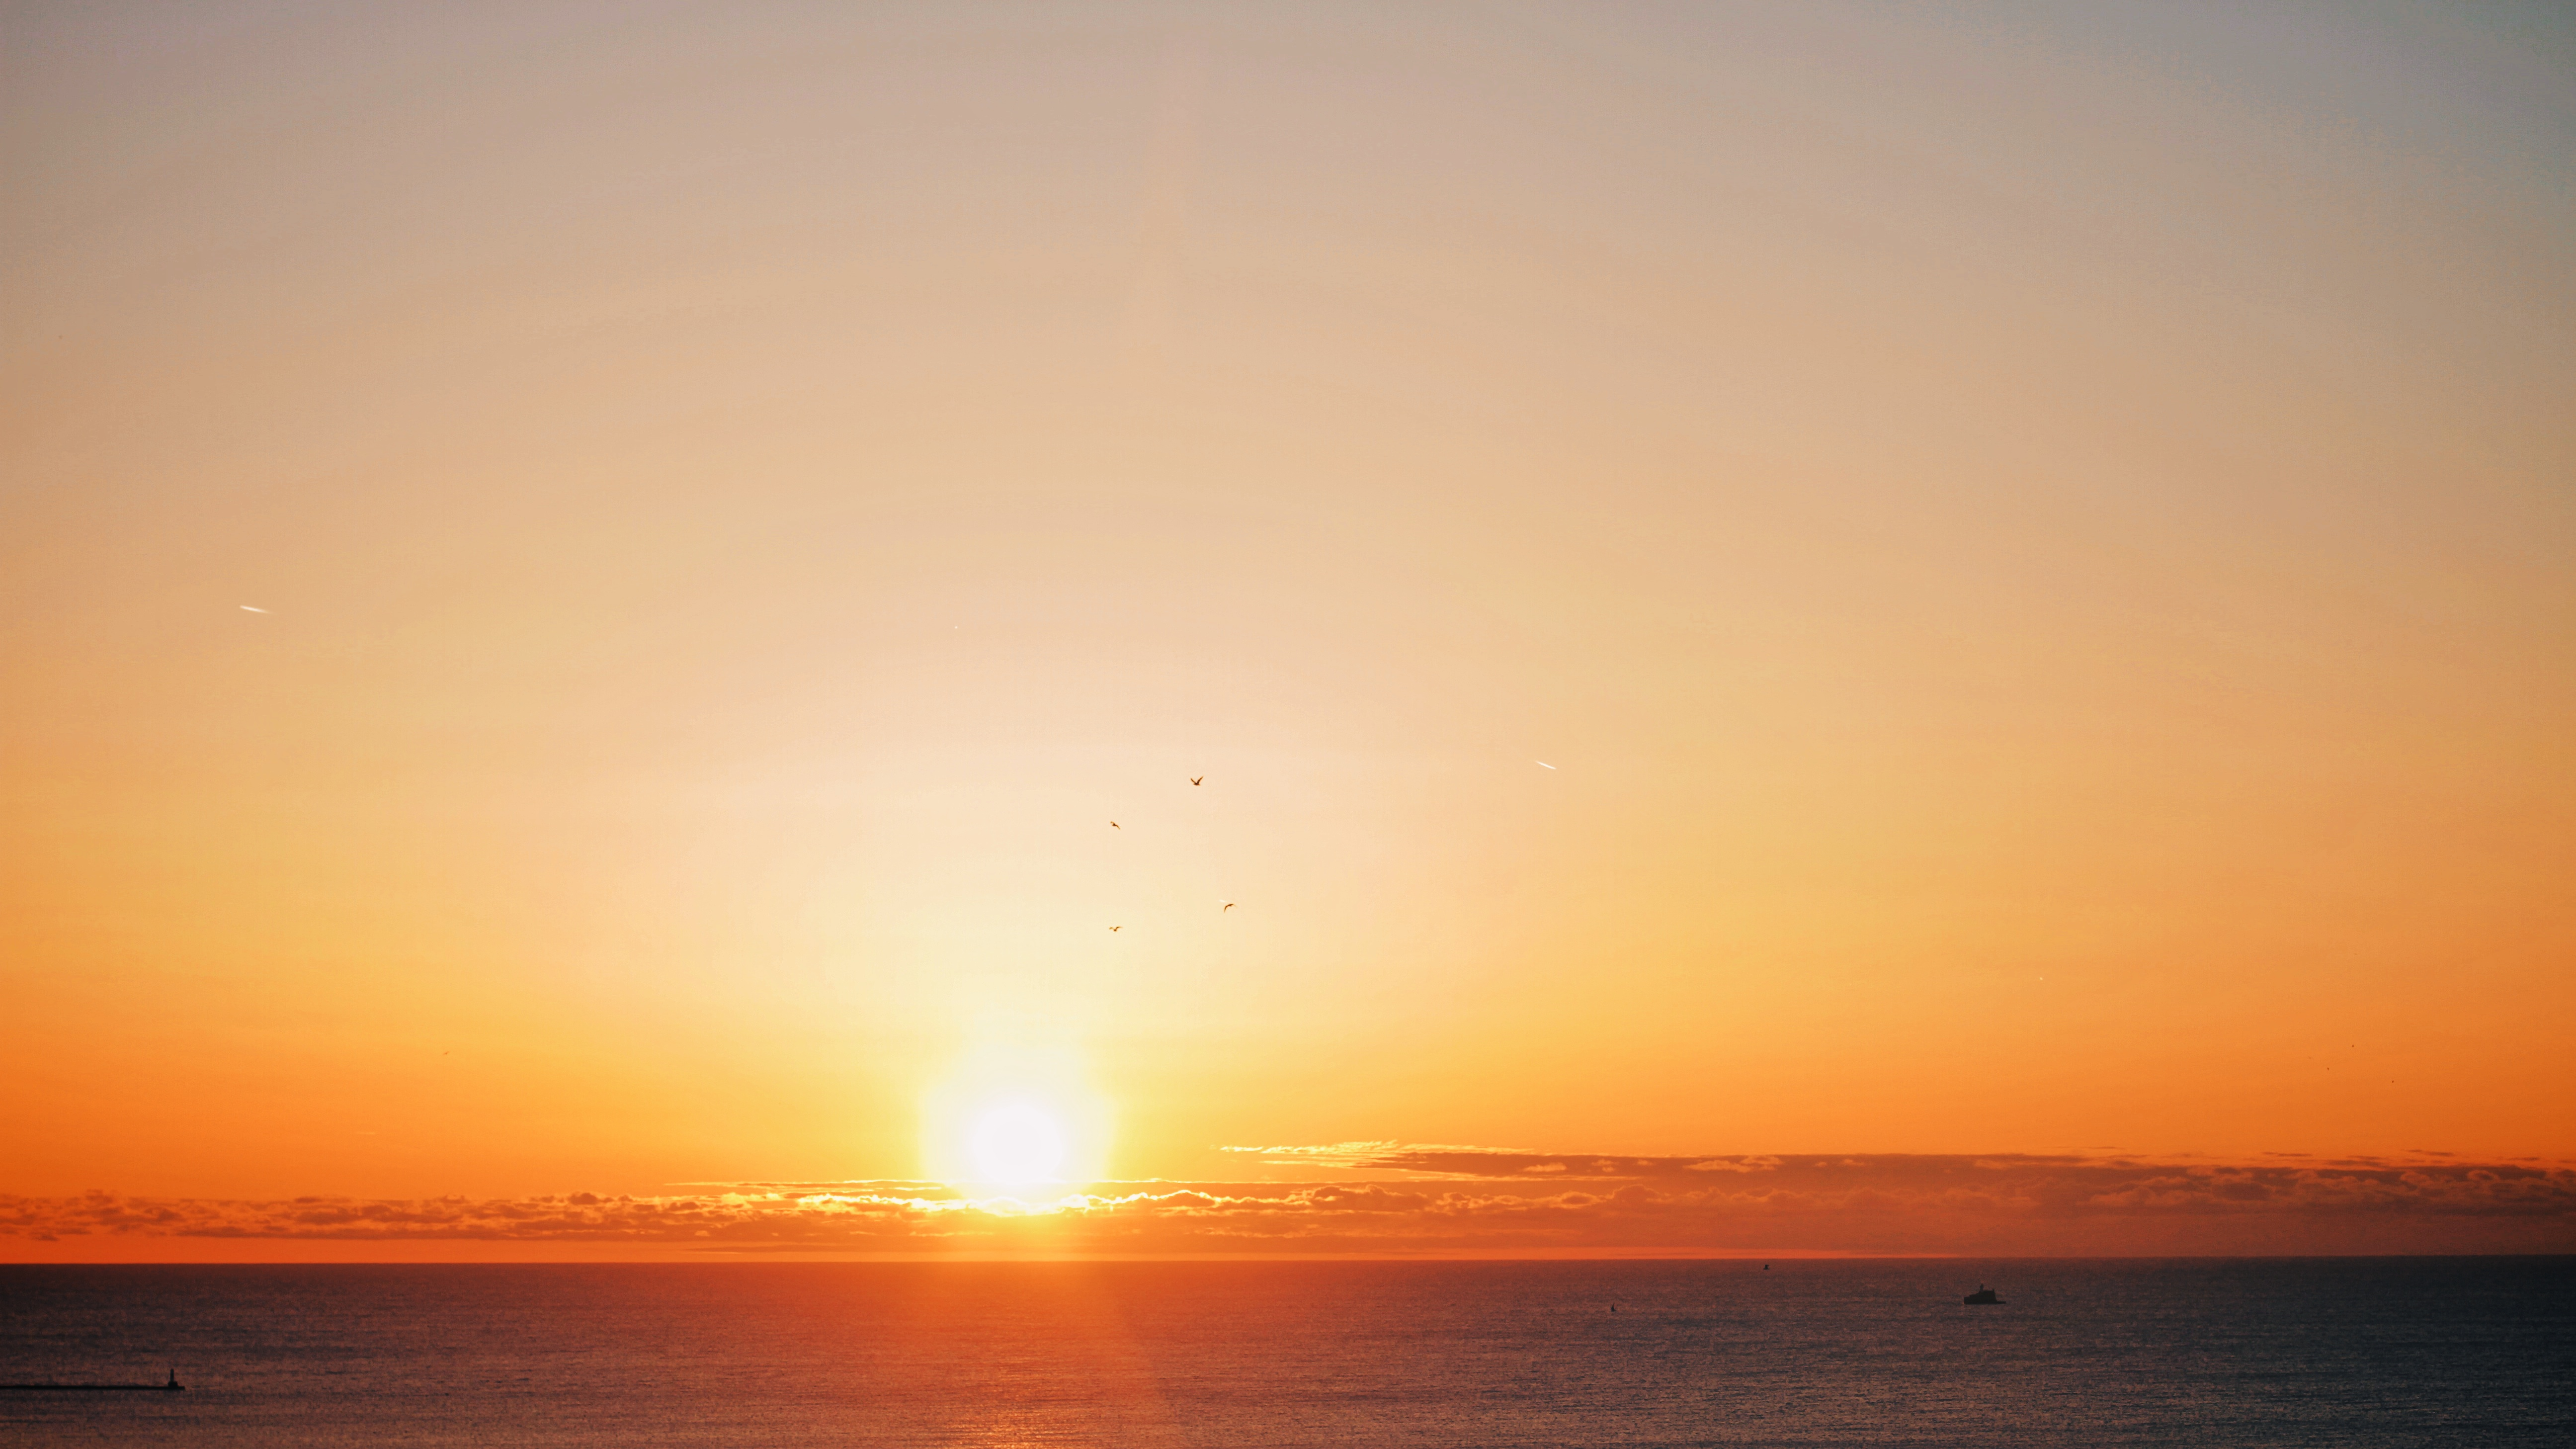 File:Sunrise over Lake Michigan.jpg - Wikimedia Commons